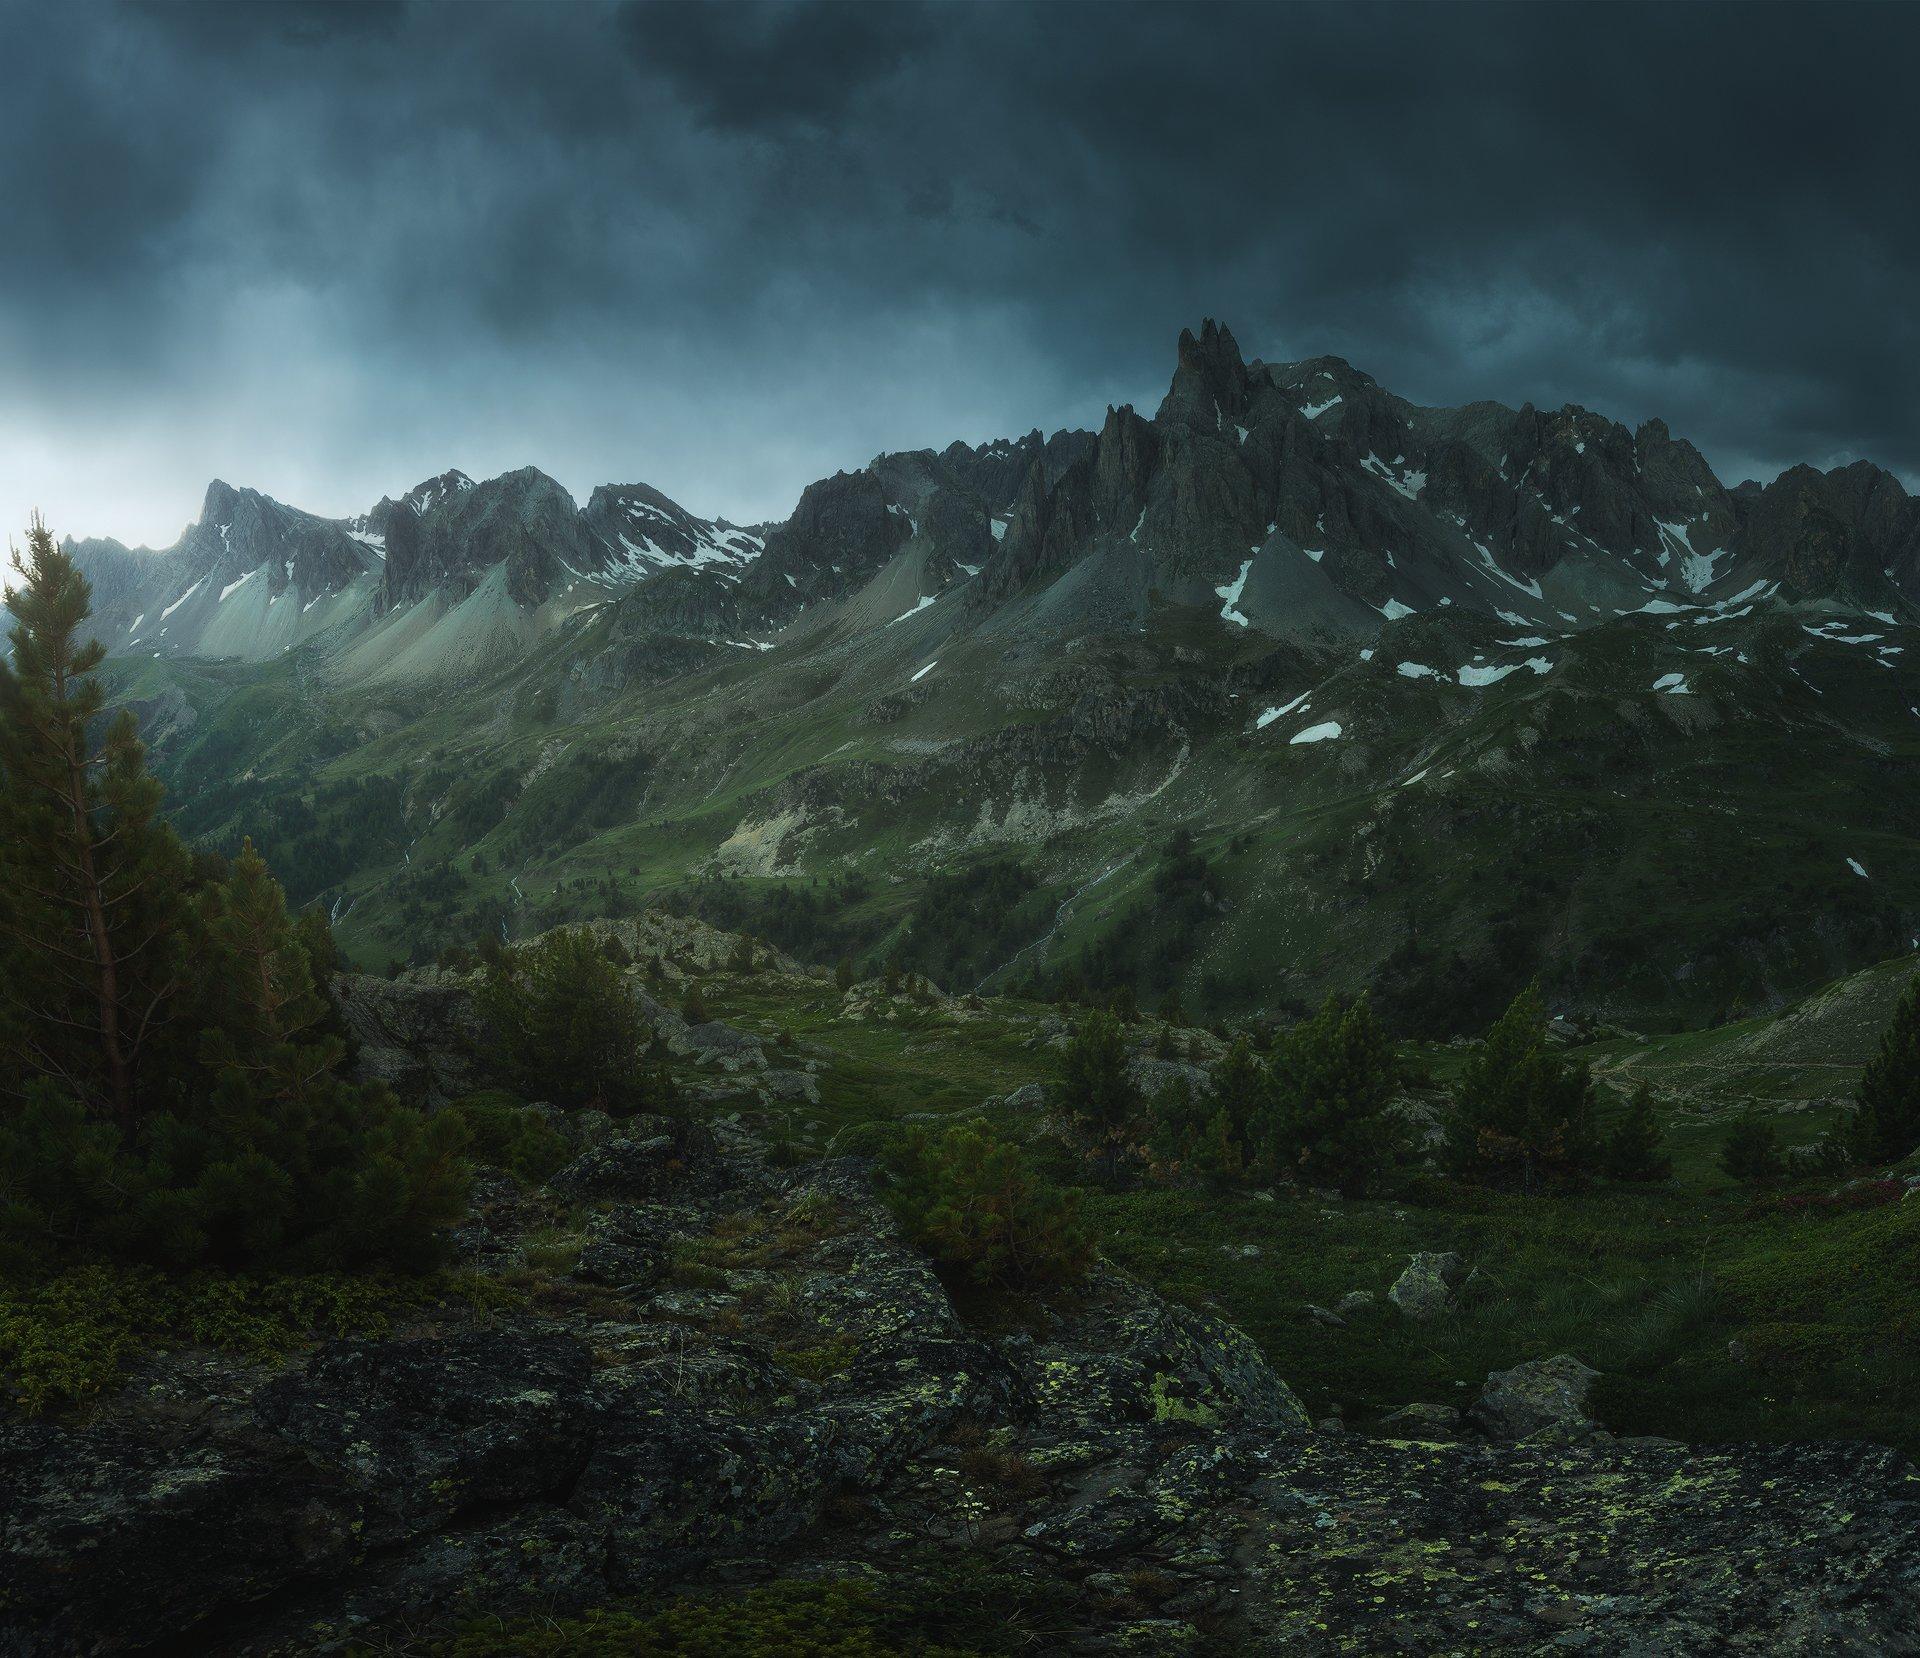 #safarphoto, #france, #workshop, #epic, #landscape, #alps, #french, #mountains, #пейзаж, #пейзажная, #фотография, #красиво, #небо, #горы, #острова, #франция, #фототур, #облака, #тучи, #альпы, #путешествие, #туризм, #отдых, #закат, Бахышев Сафар